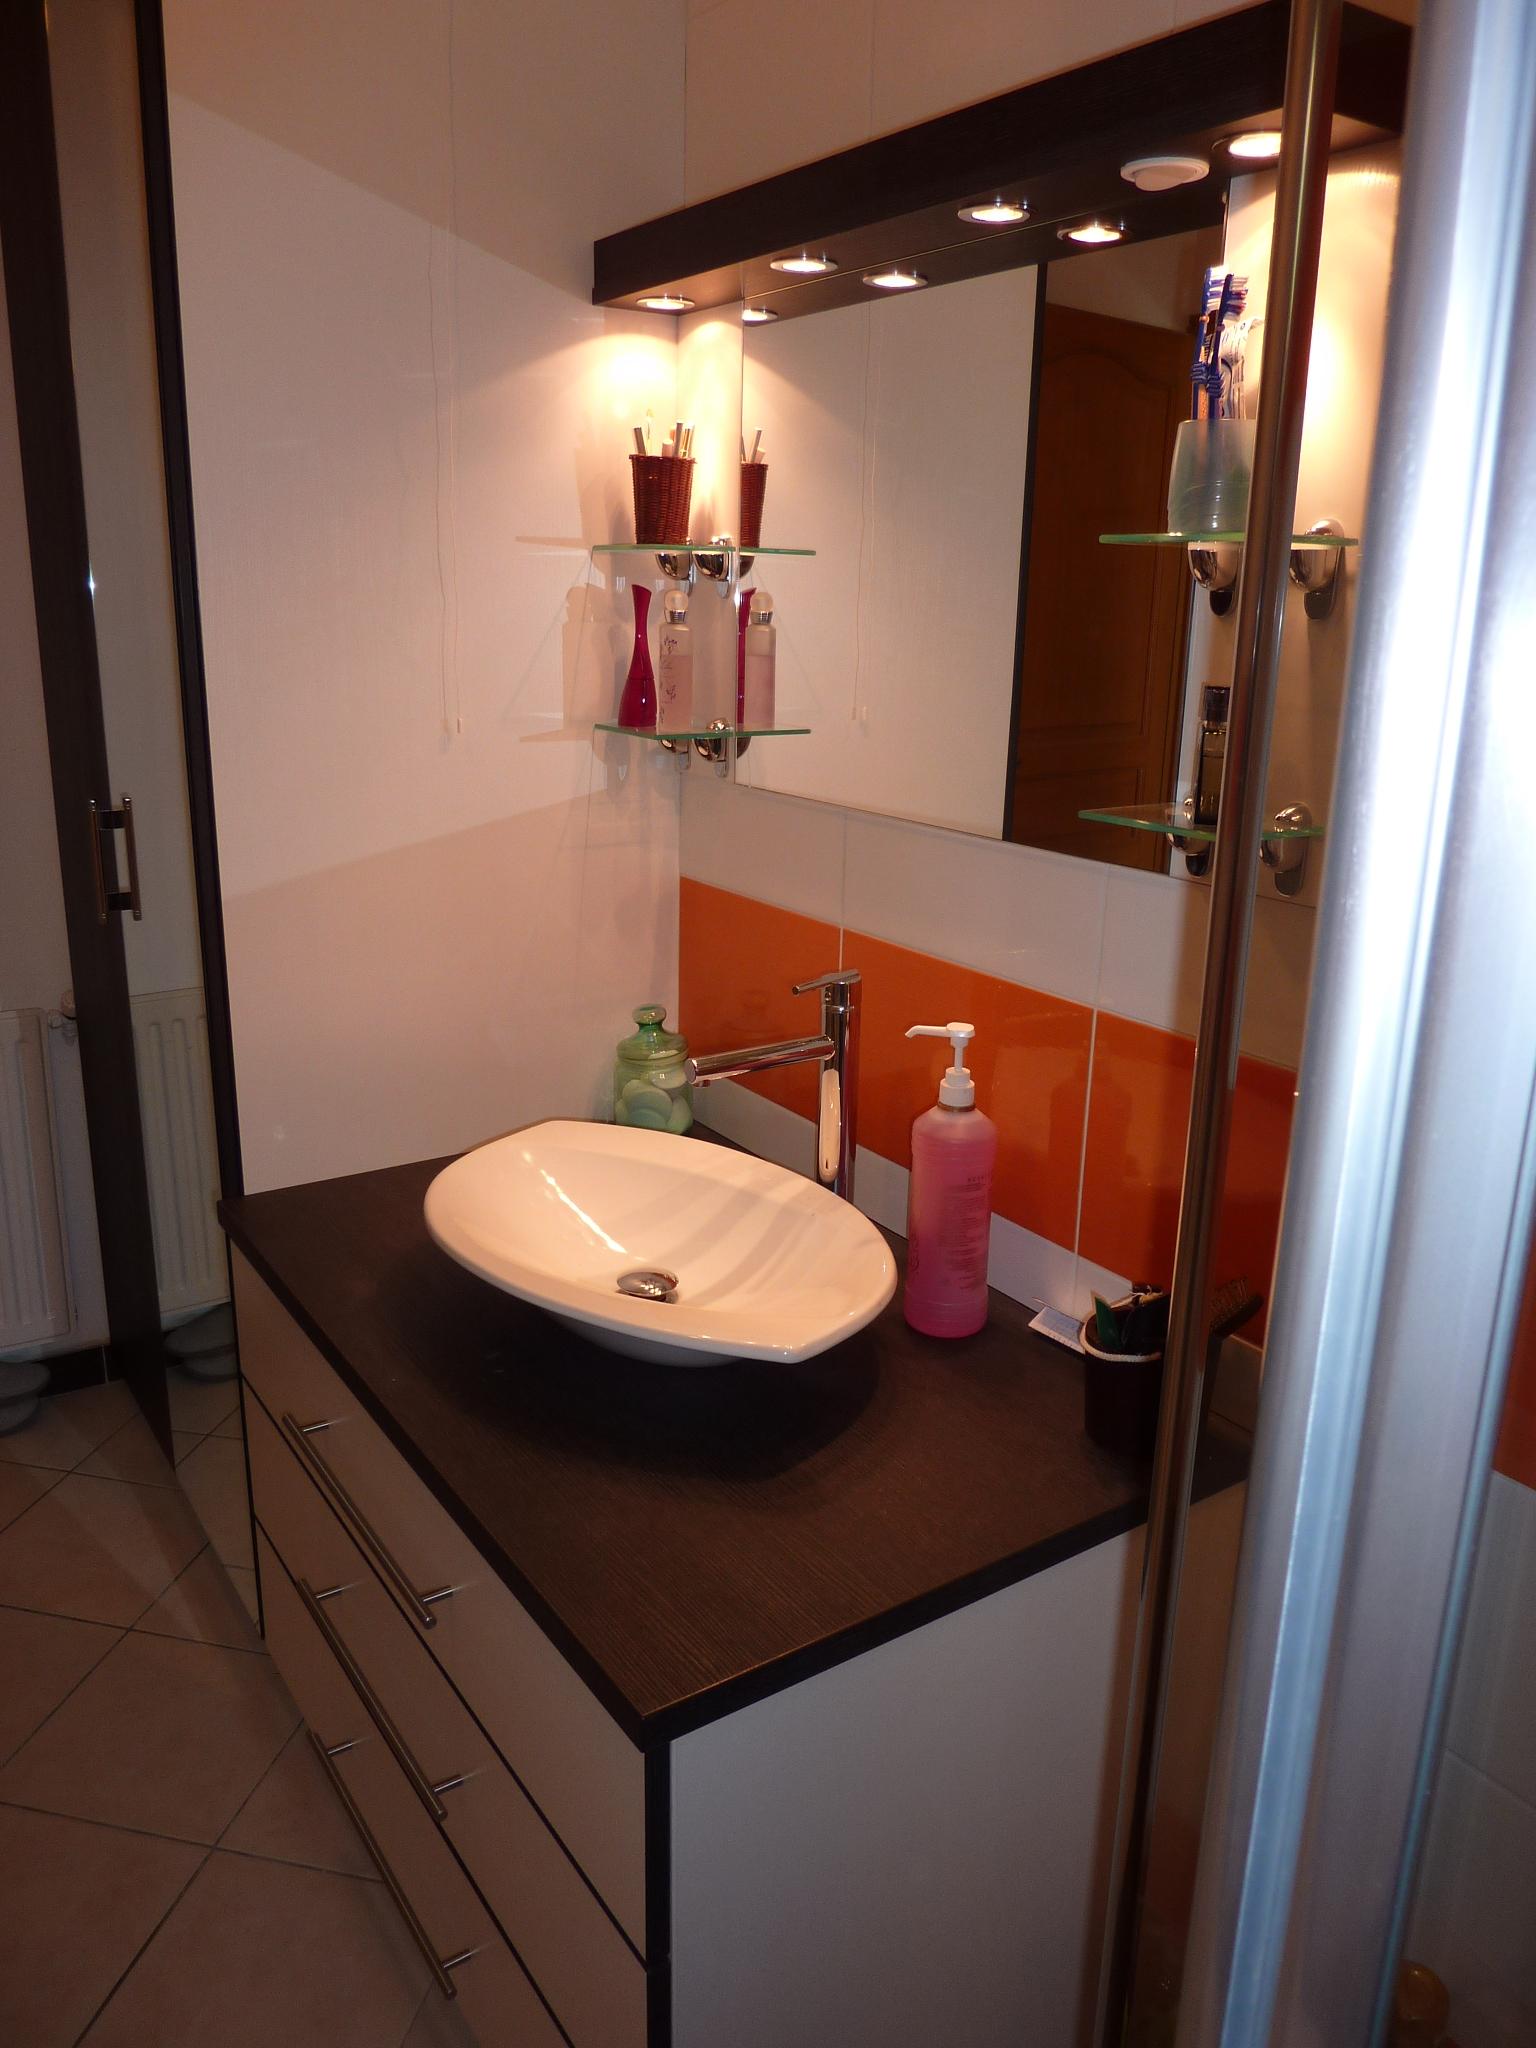 Meuble de salle de bains avec grands tiroirs ralentisseurs for Meuble de salle de bain sur mesure